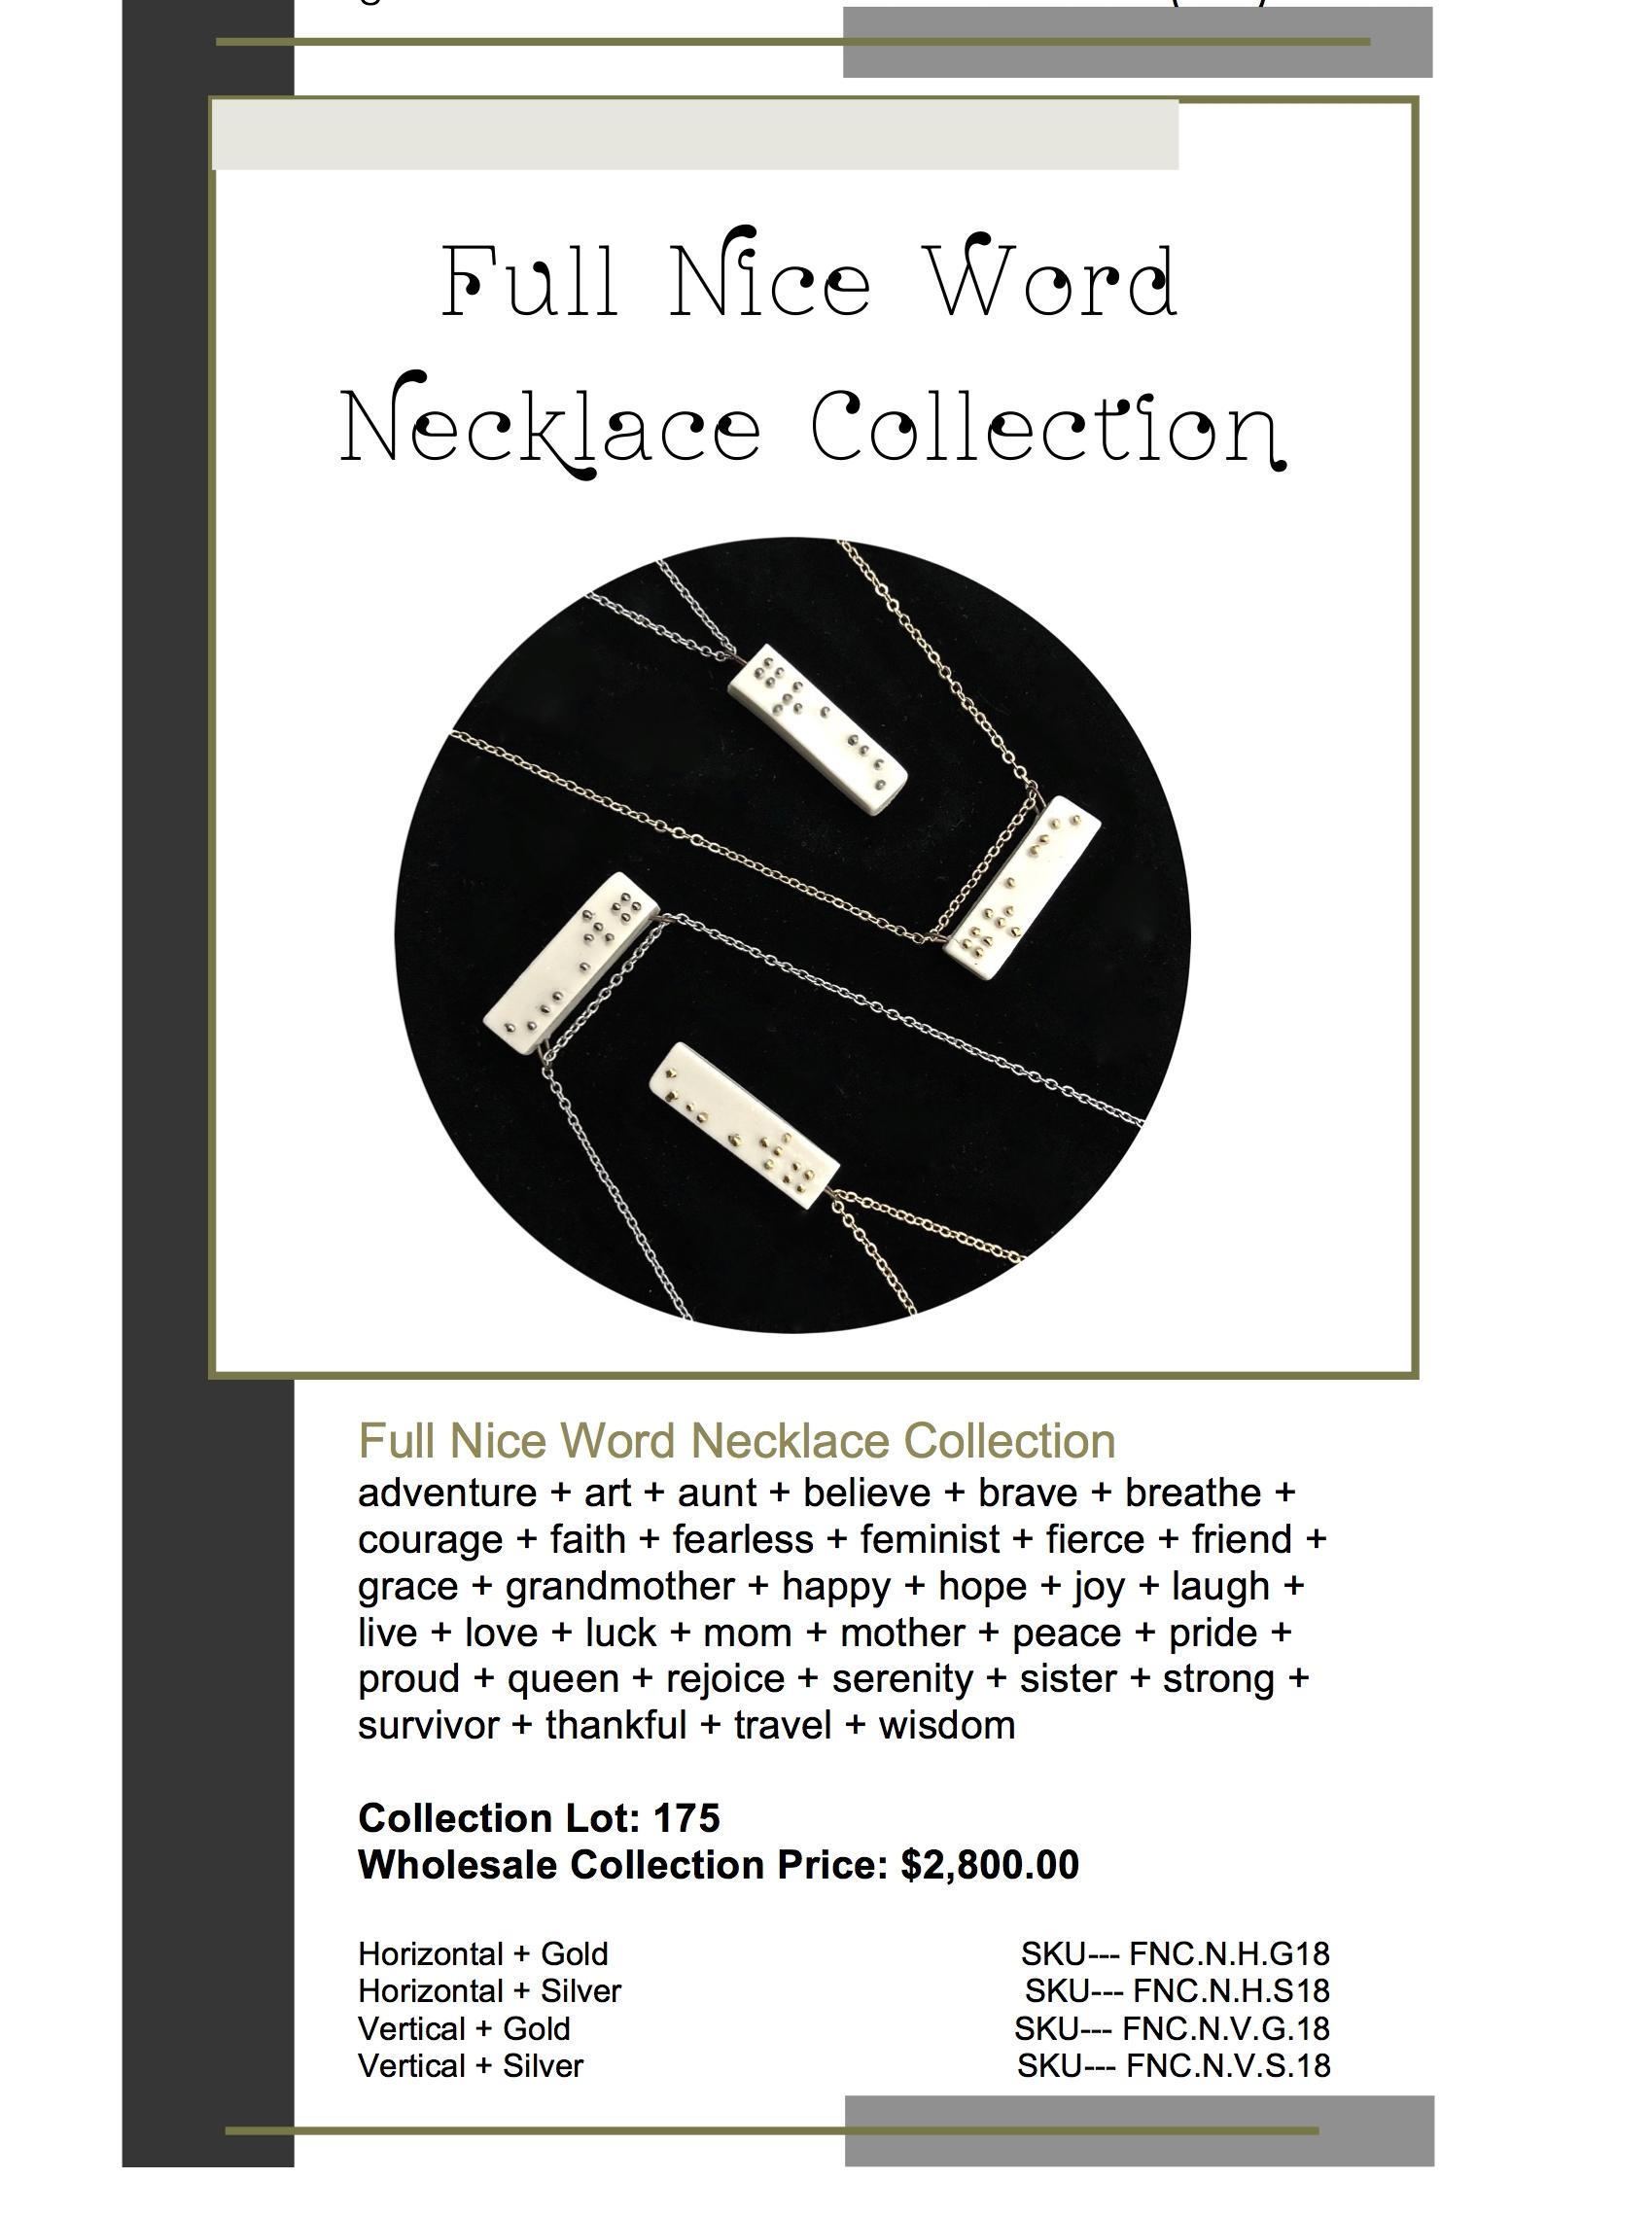 Wholesale Catalog pg 8.jpg